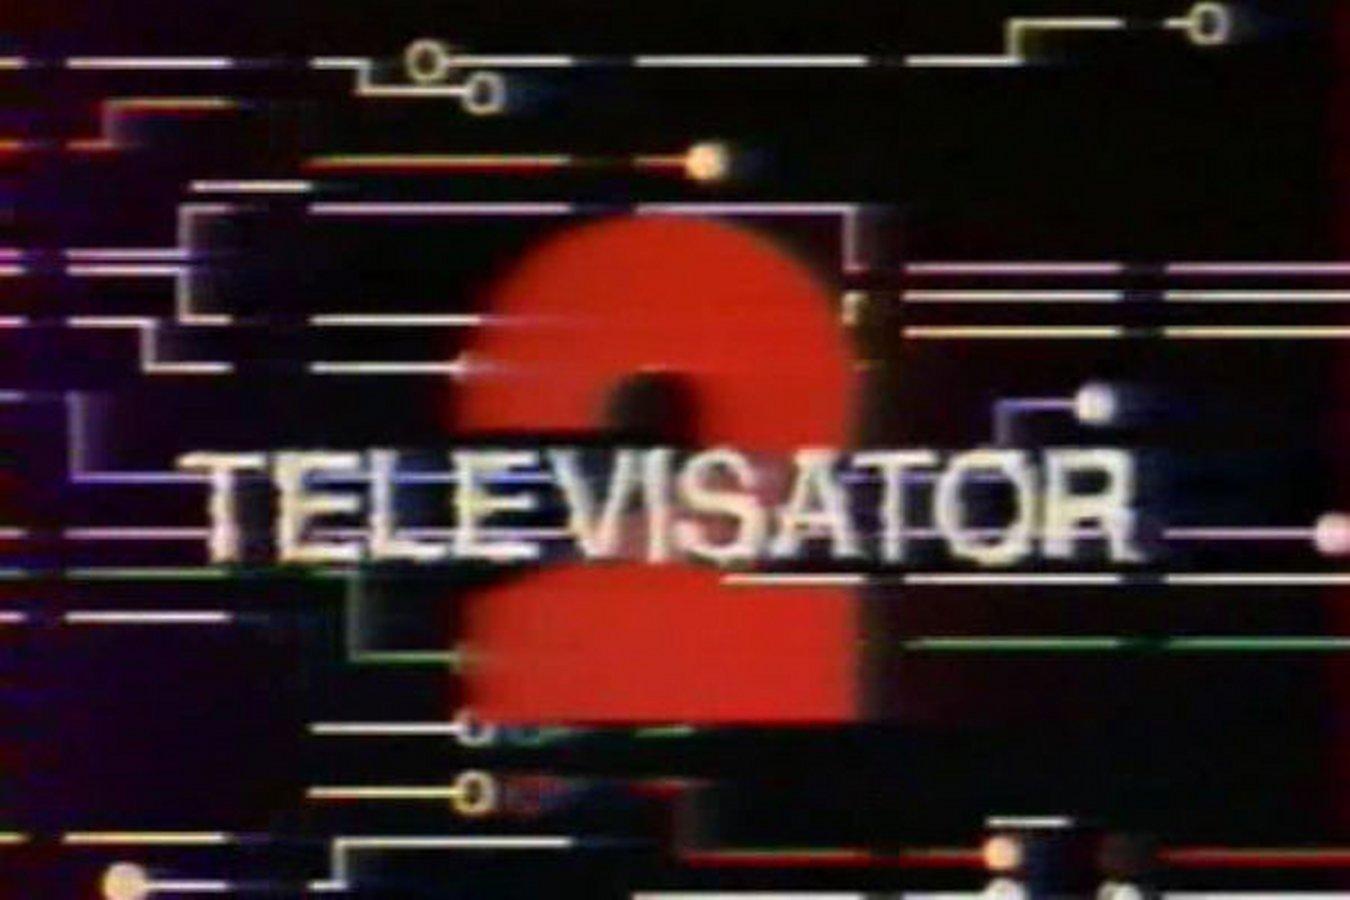 logo_televisator